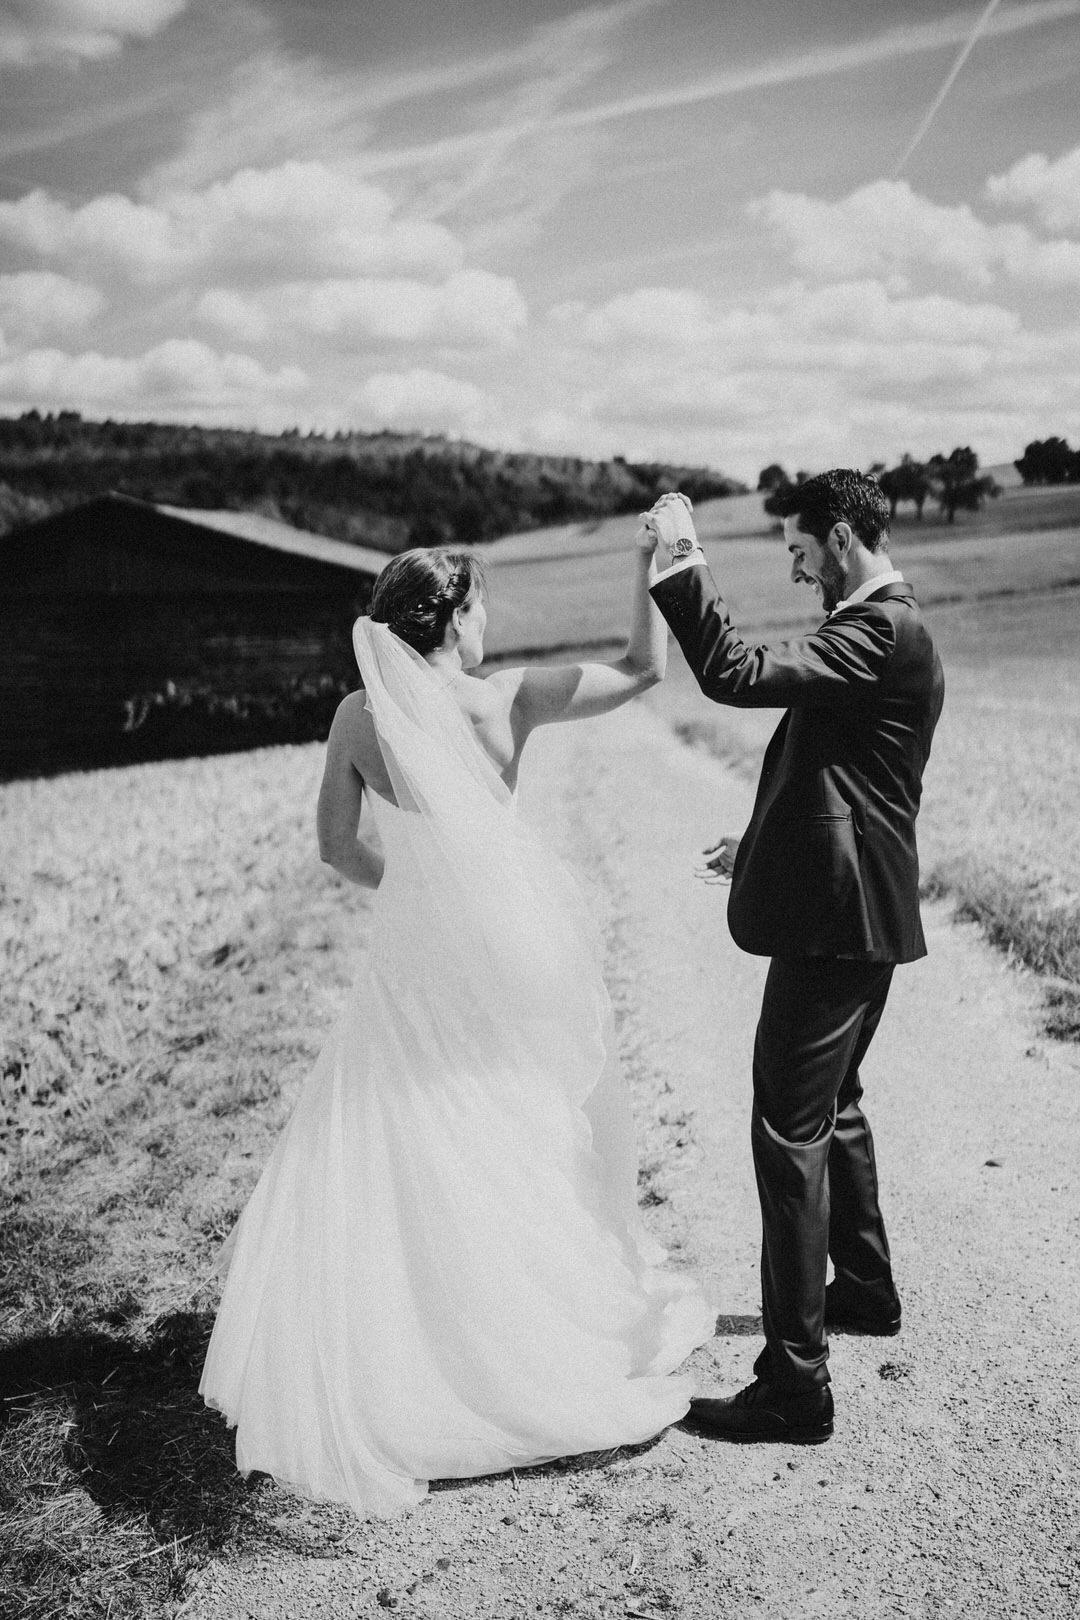 Probe des Hochzeitstanzes beim Paar-Shooting in Wiesbadener Umgebung